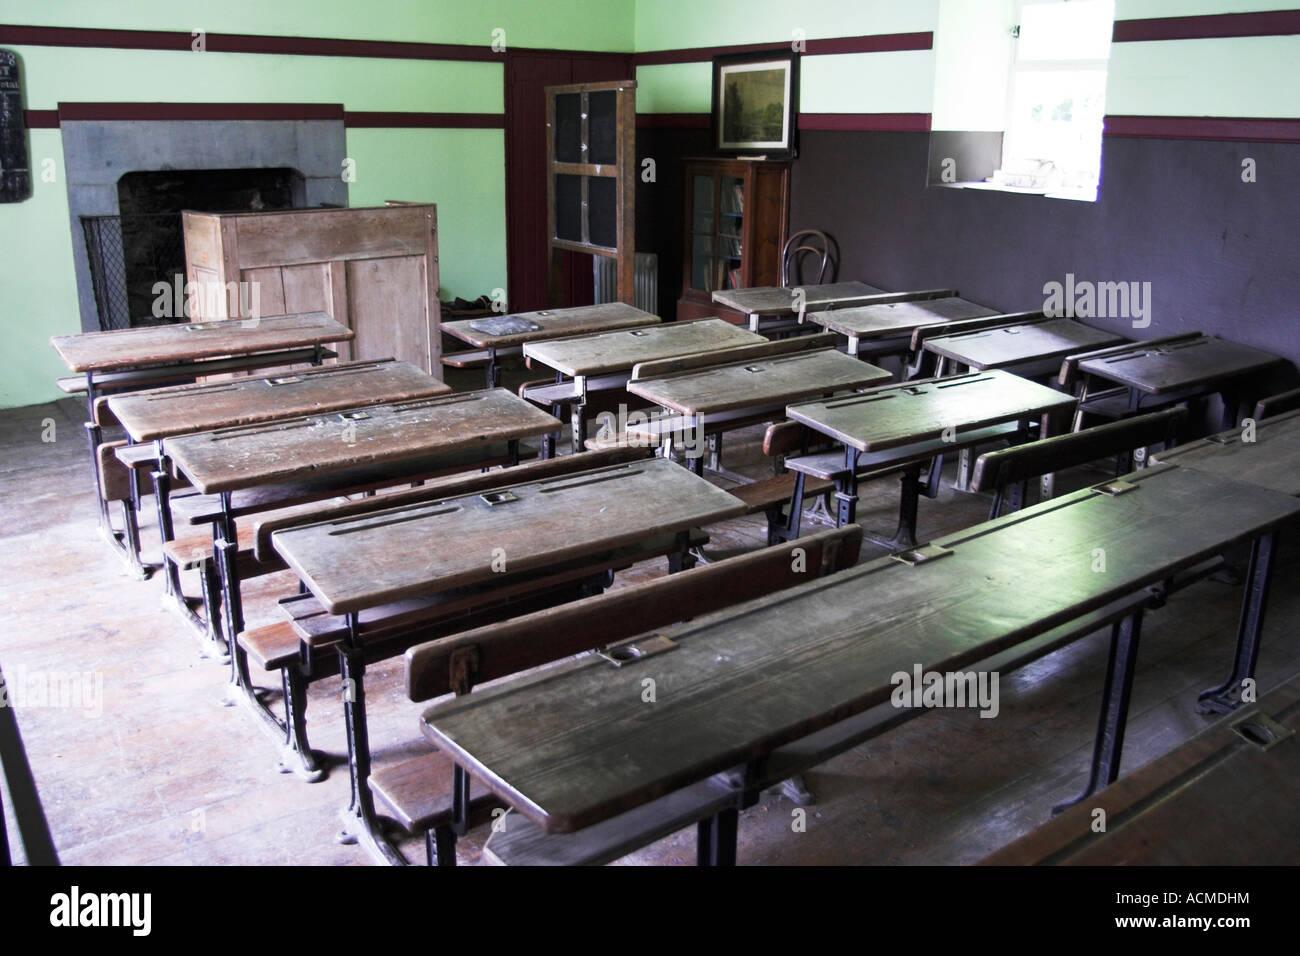 A 19th Century school room at Bunratty Folk Park Co Clare Ireland - Stock Image